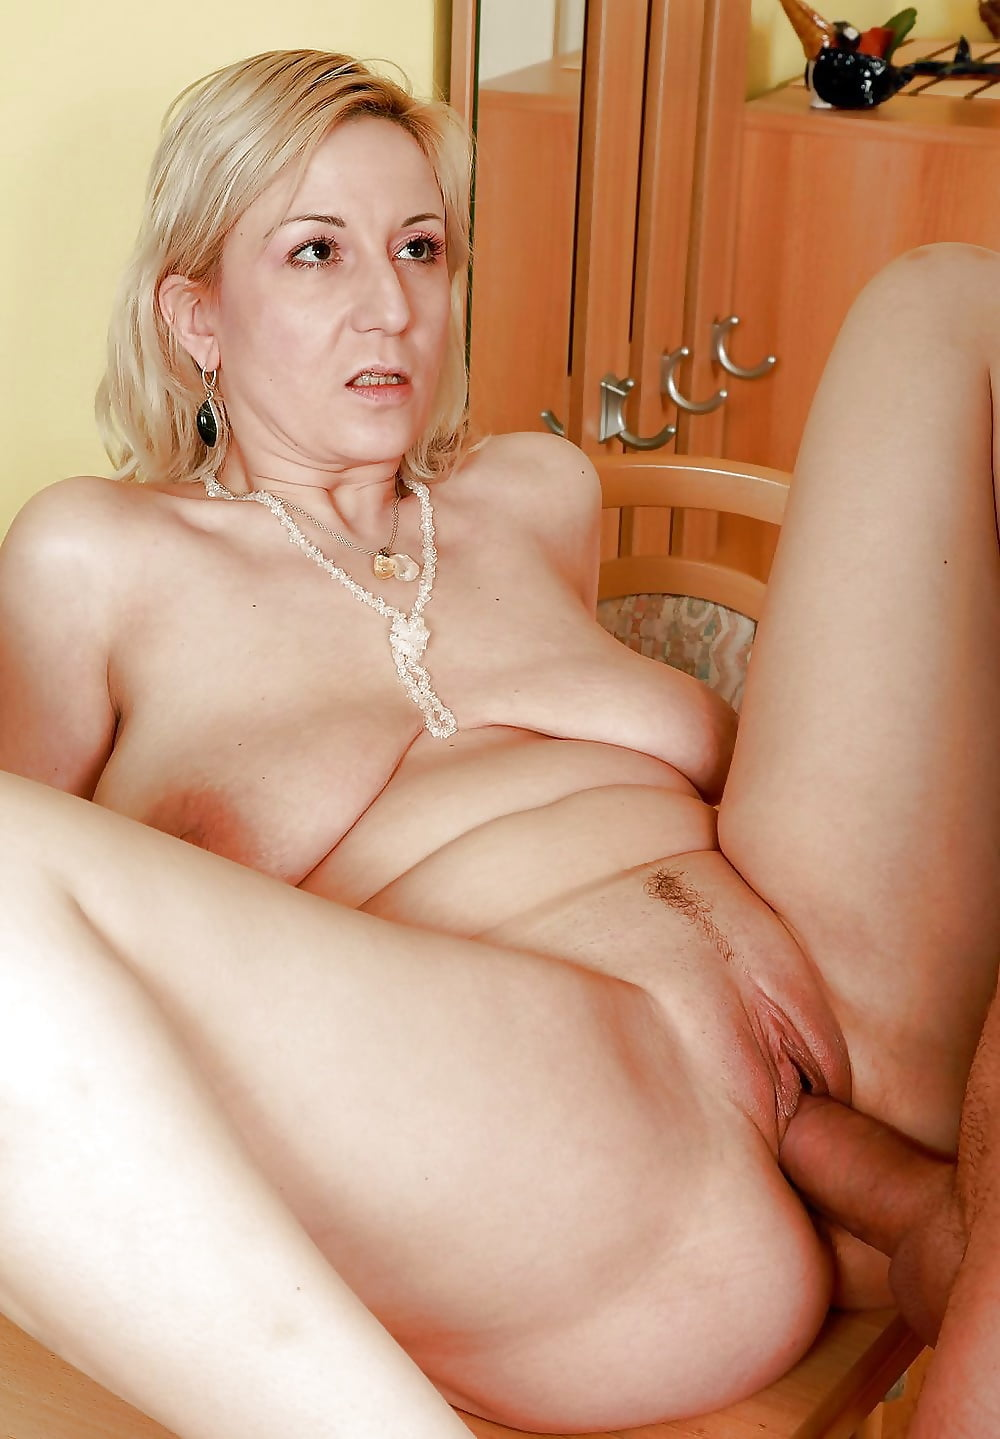 Mature nude women, naked milfs, mature porn pics